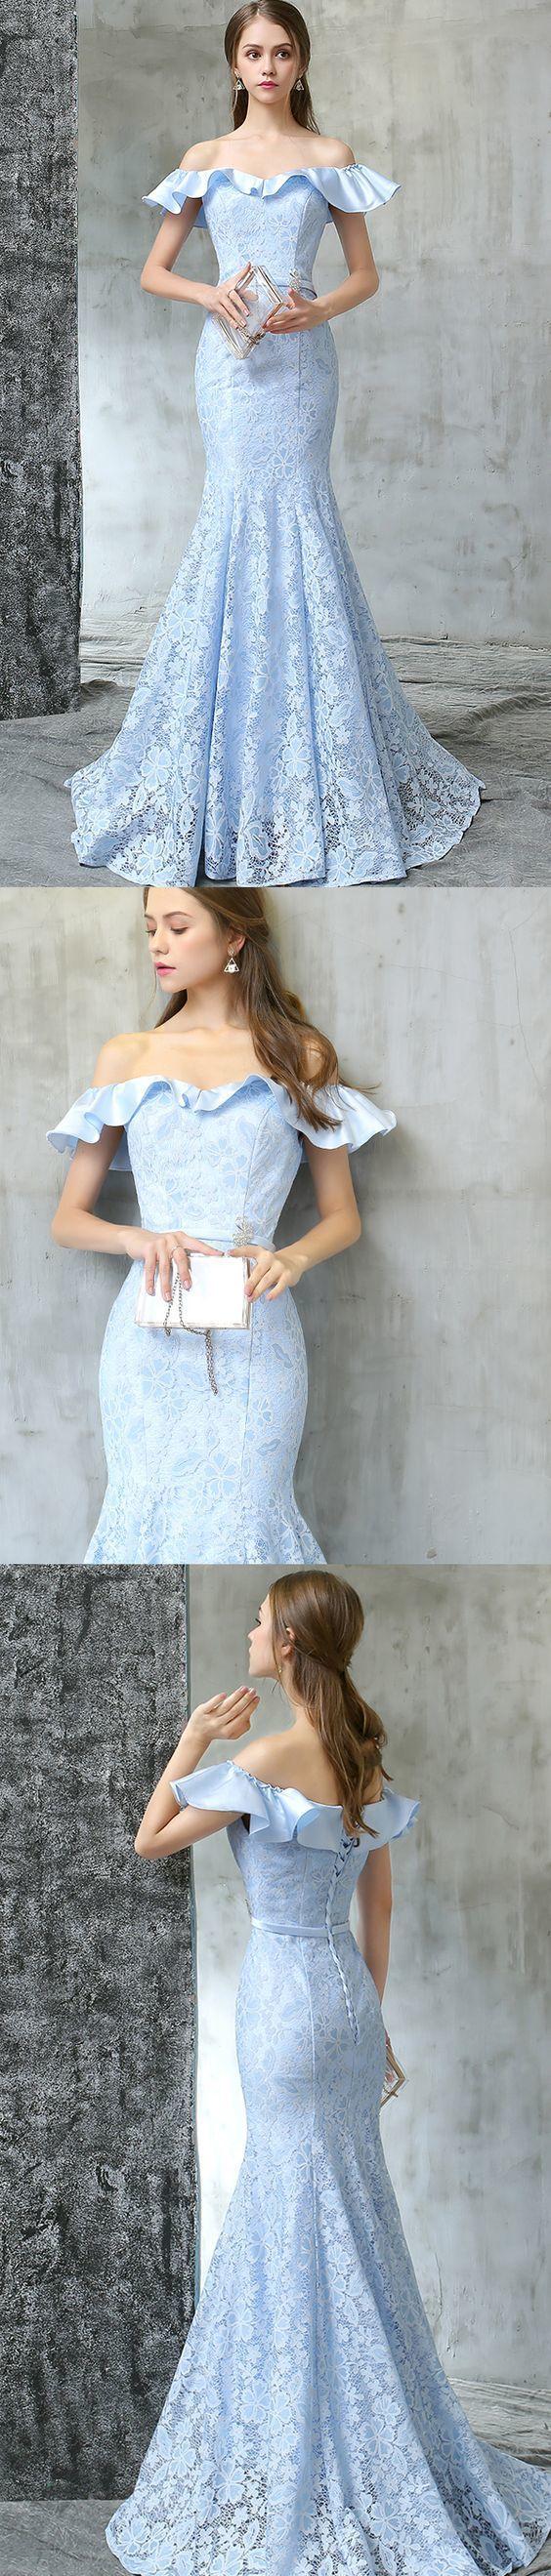 Off Shoulder Prom Dress, Mermaid Lace Prom Dress,Formal Prom Dress,Custom